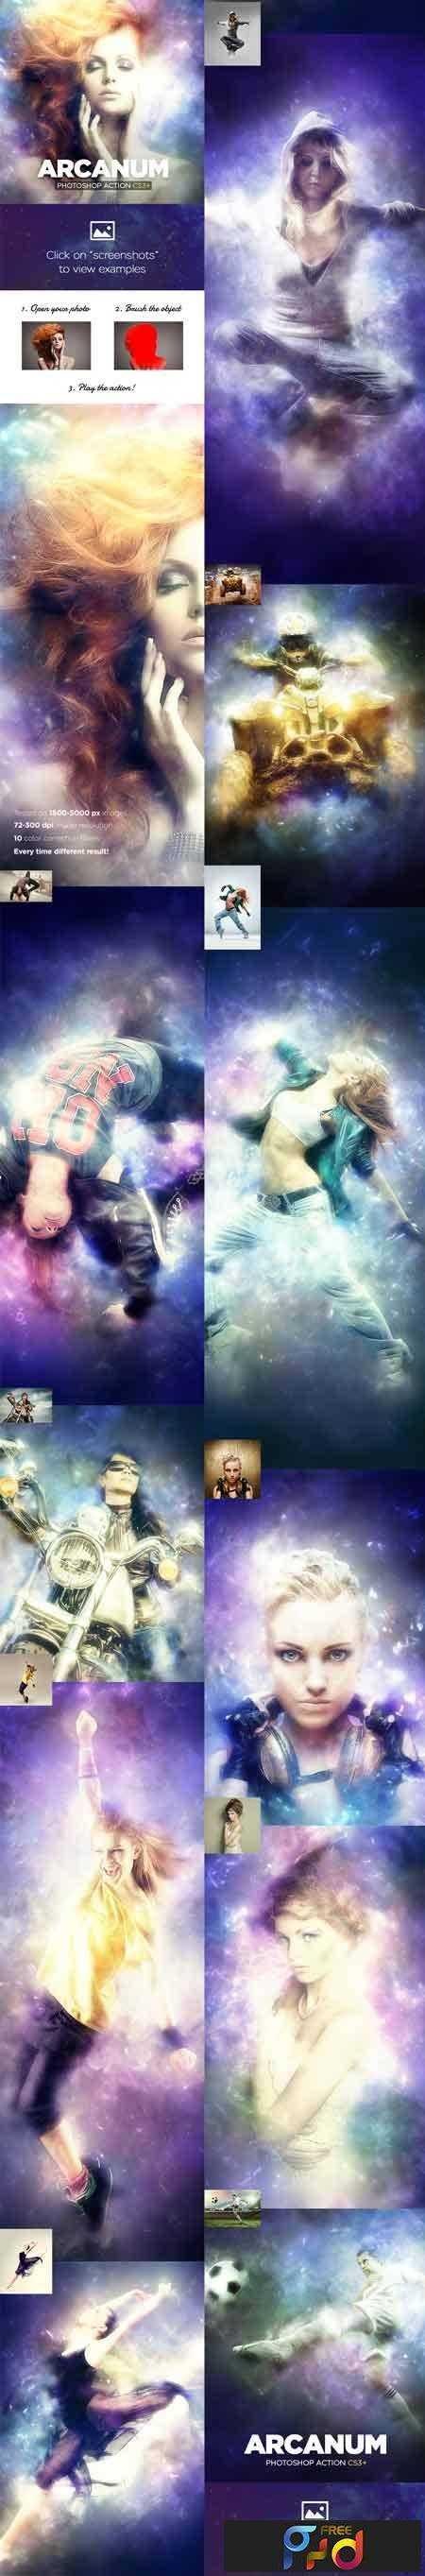 freepsdvn-com_1468170468_arcanum-photoshop-action-cs3-16817438